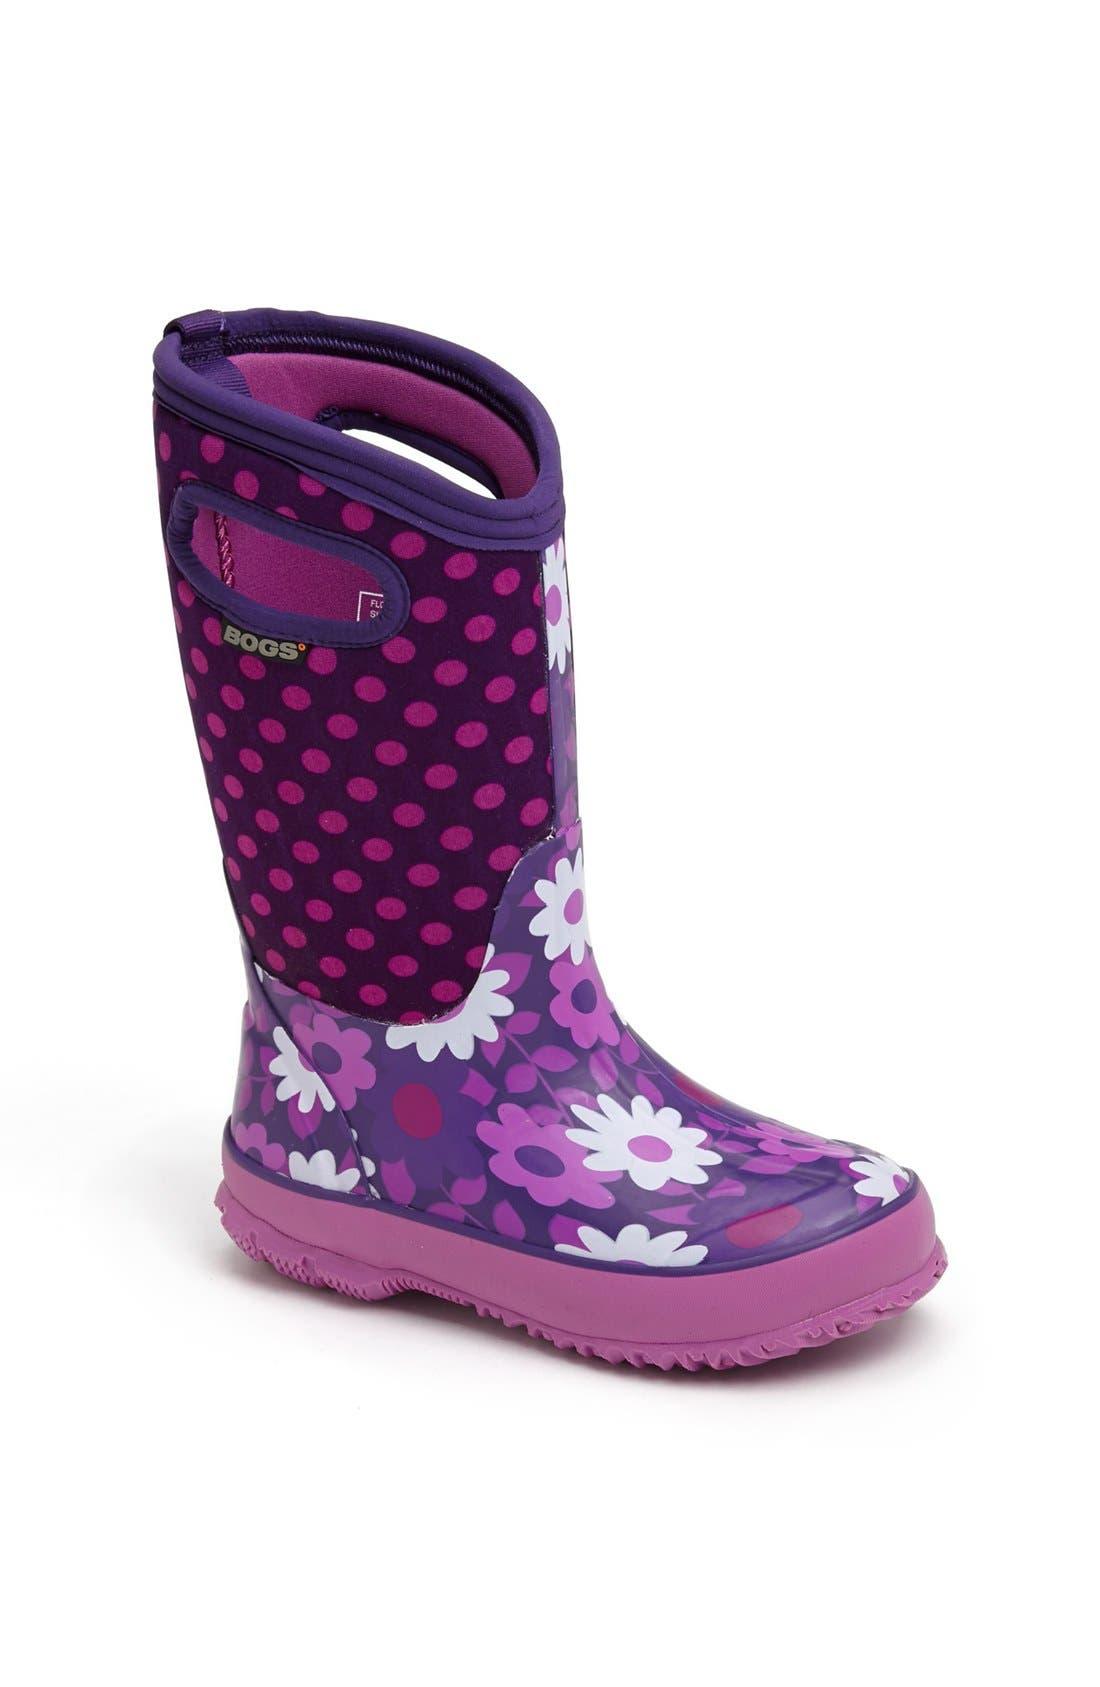 Alternate Image 1 Selected - Bogs 'Classic High - Flower Dot' Waterproof Boot (Walker, Toddler, Little Kid & Big Kid)